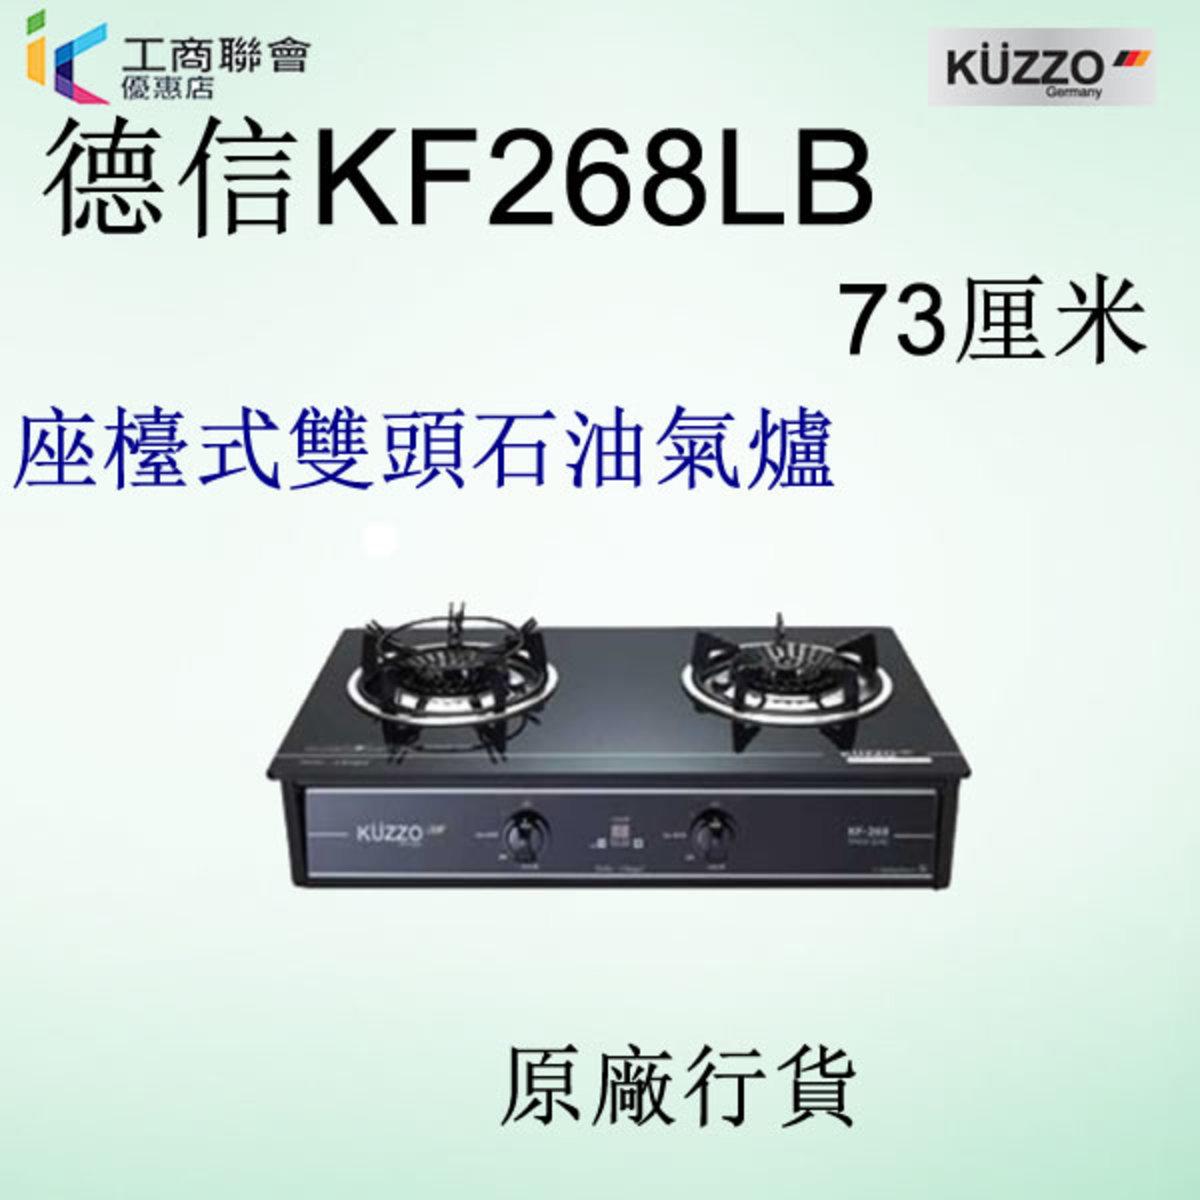 KF268LB 73厘米 座枱式雙頭石油氣爐